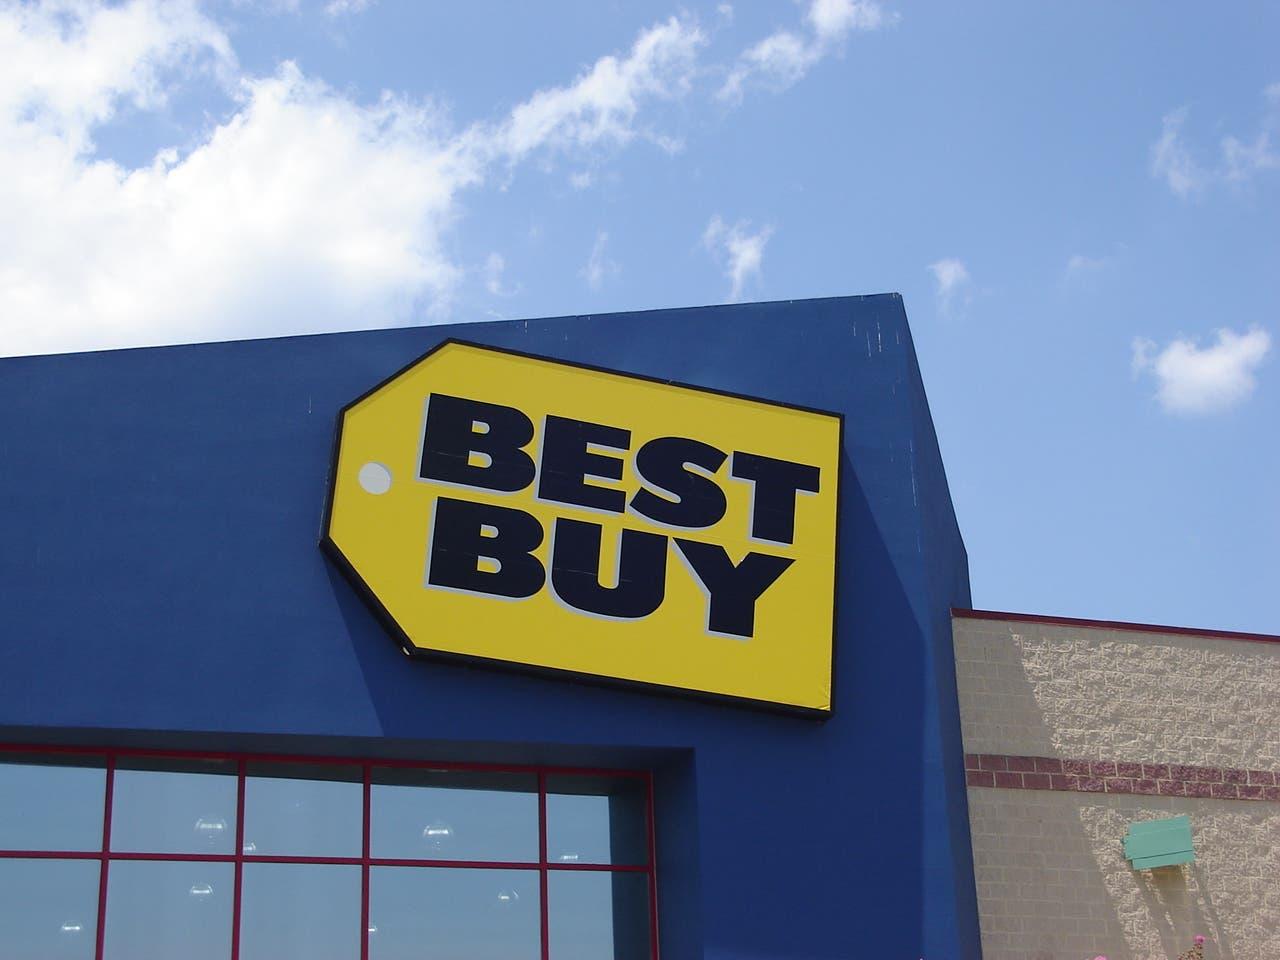 42 Best Buy Stores To Close Woodbridge Va Patch